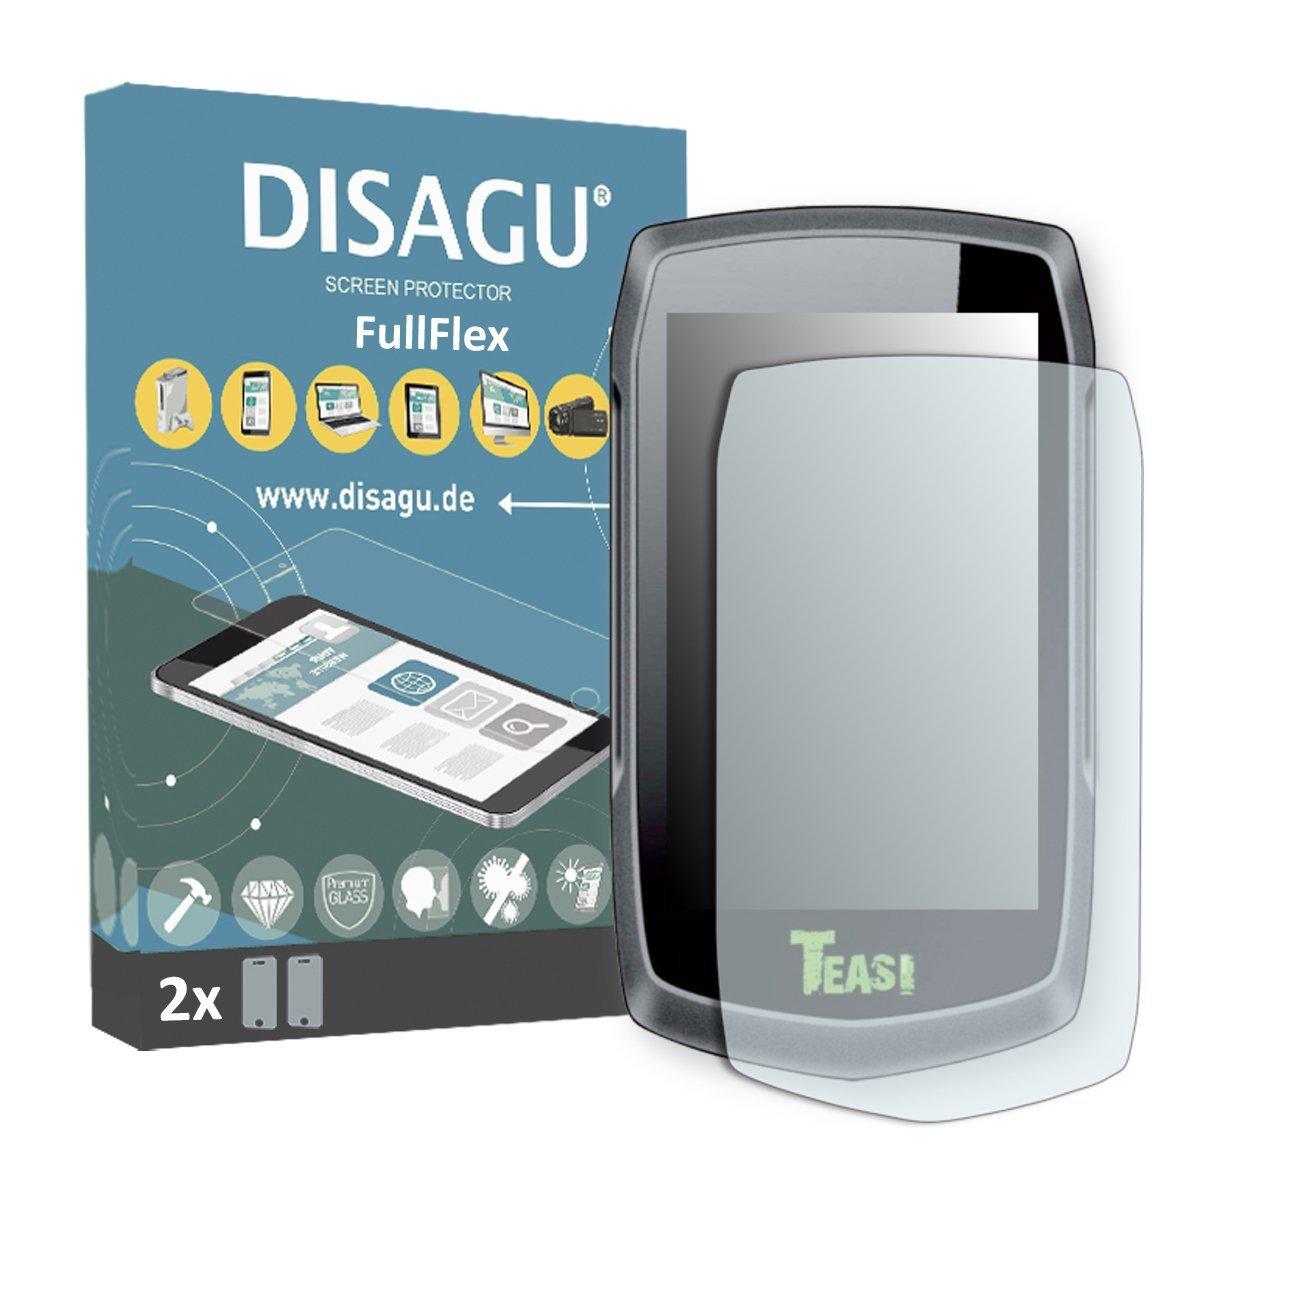 2 x Disagu FullFlex screen protector for Teasi One2 foil screen protector